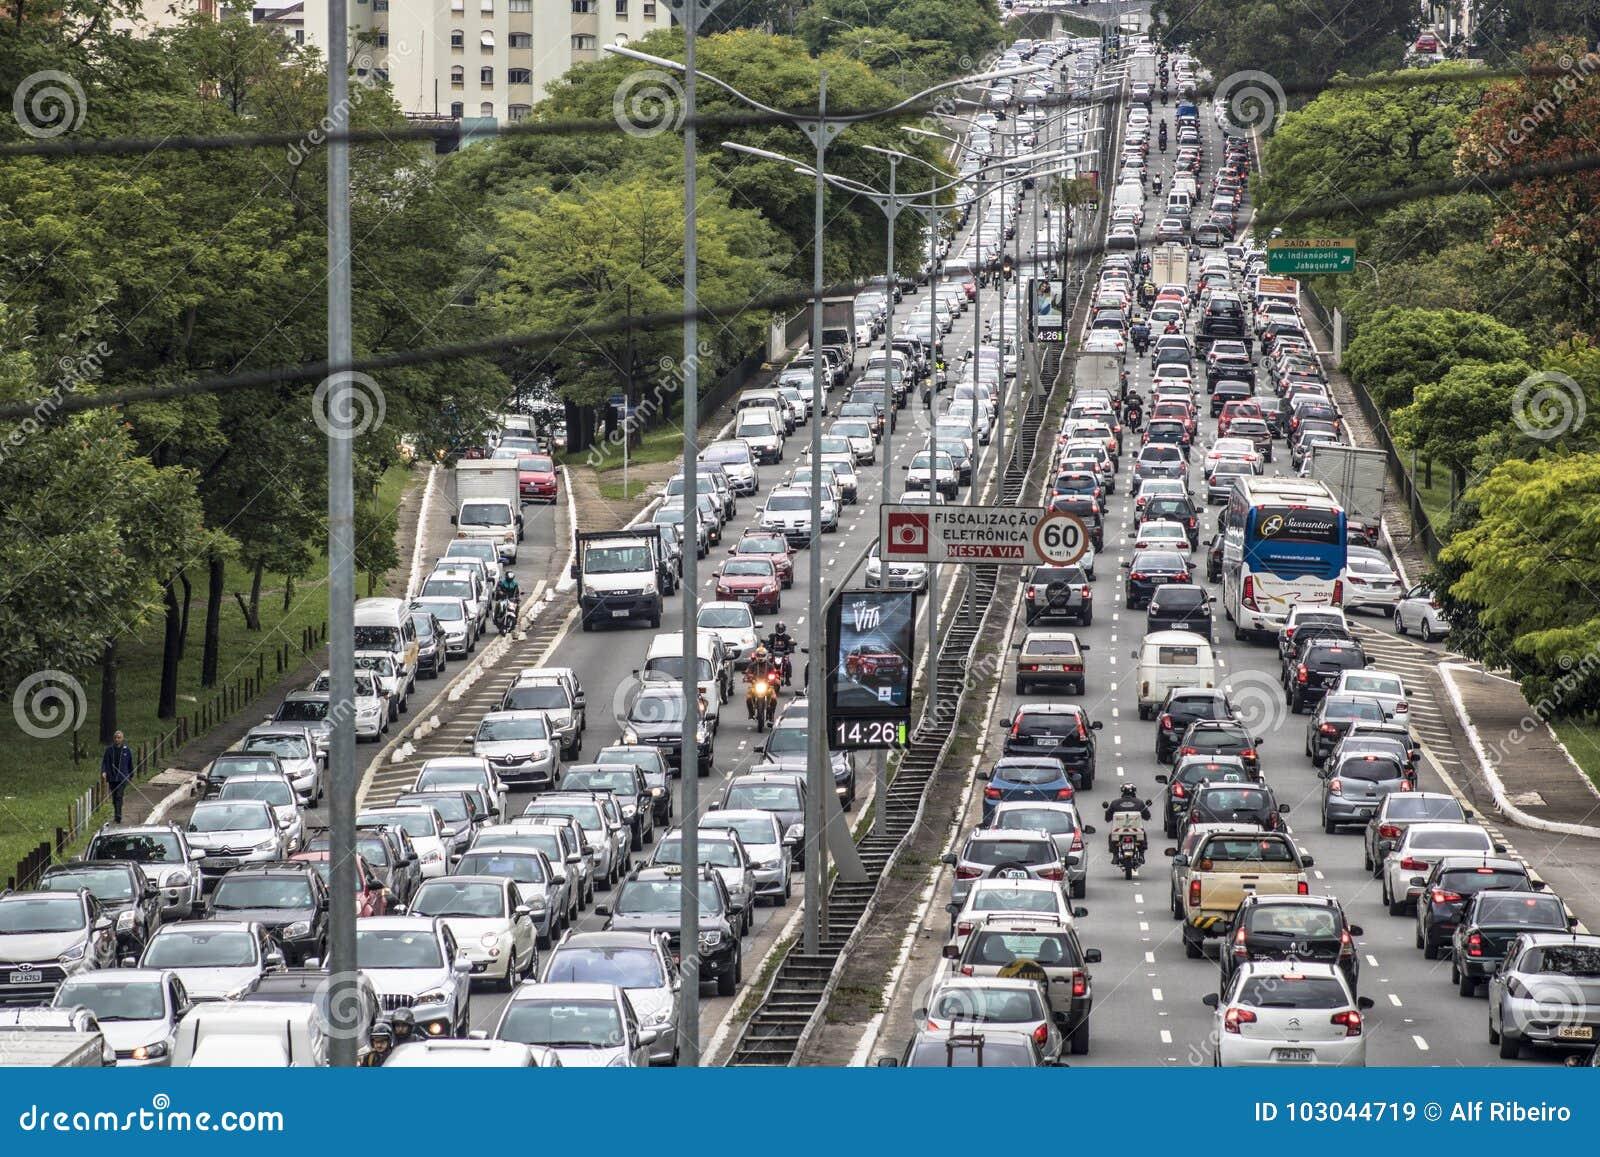 Traffic jam nightmare in Brazil | Newshub |Sao Paulo Brazil Traffic